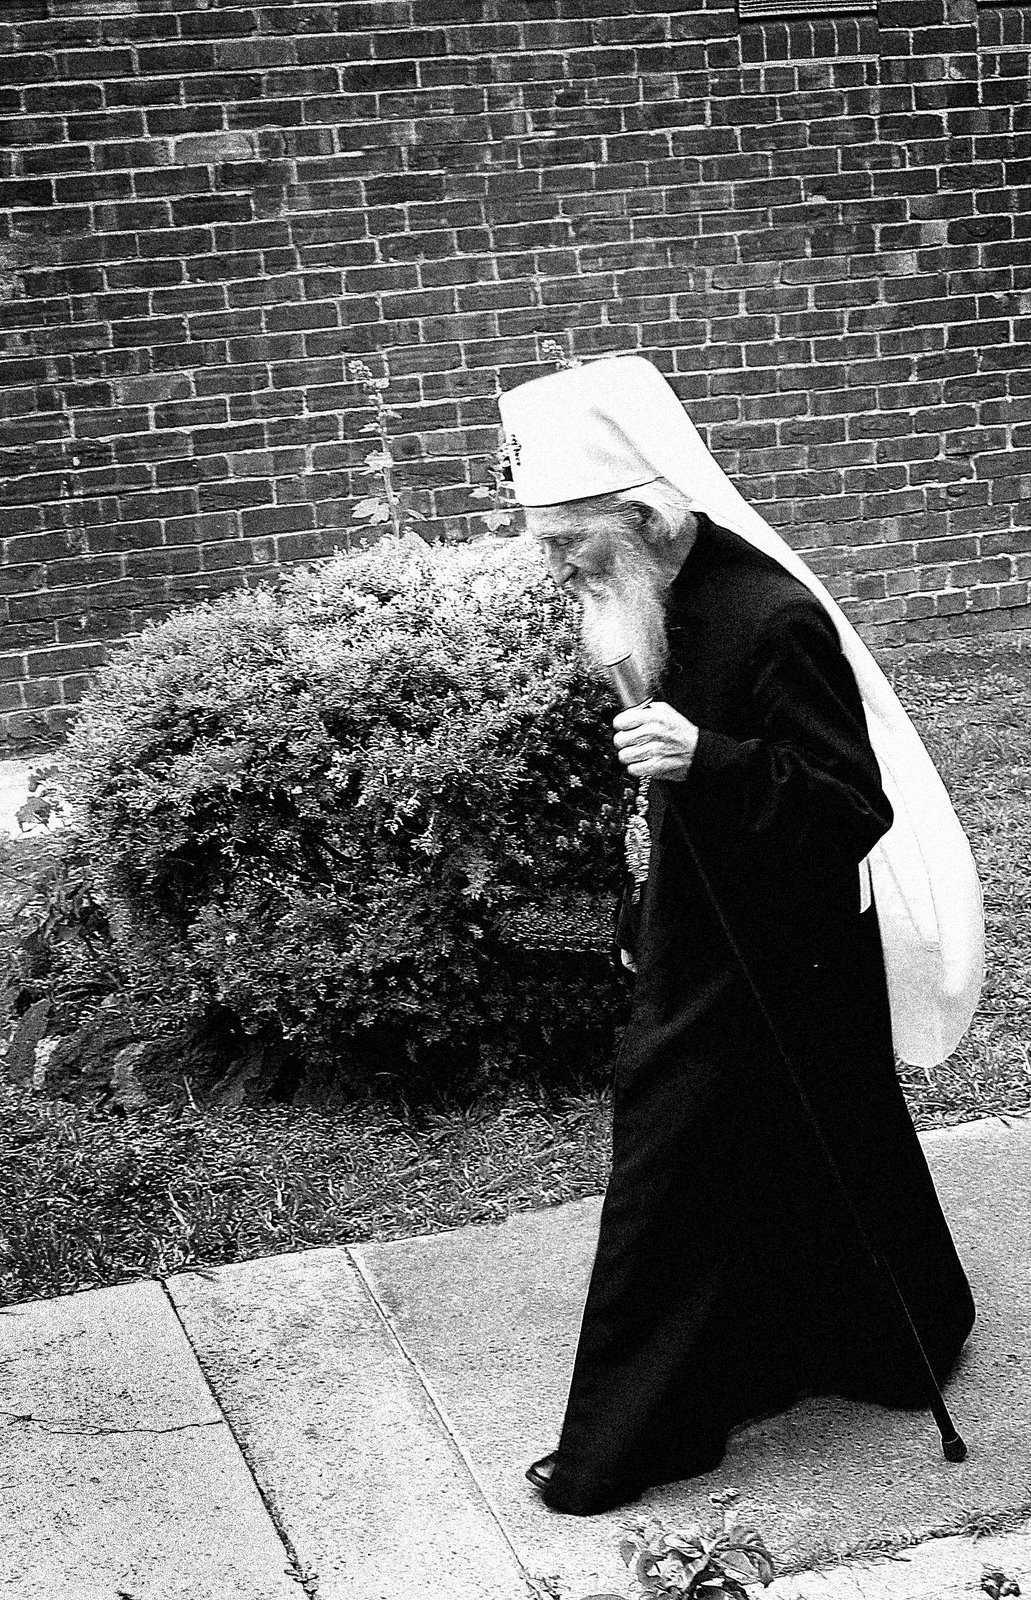 Patriarhul Pavle al Serbiei: A FI OM SI PRINTRE NEOAMENI. <i>&#8220;Cel mai important e ca noi sa nu ajungem lupi&#8221;</i>